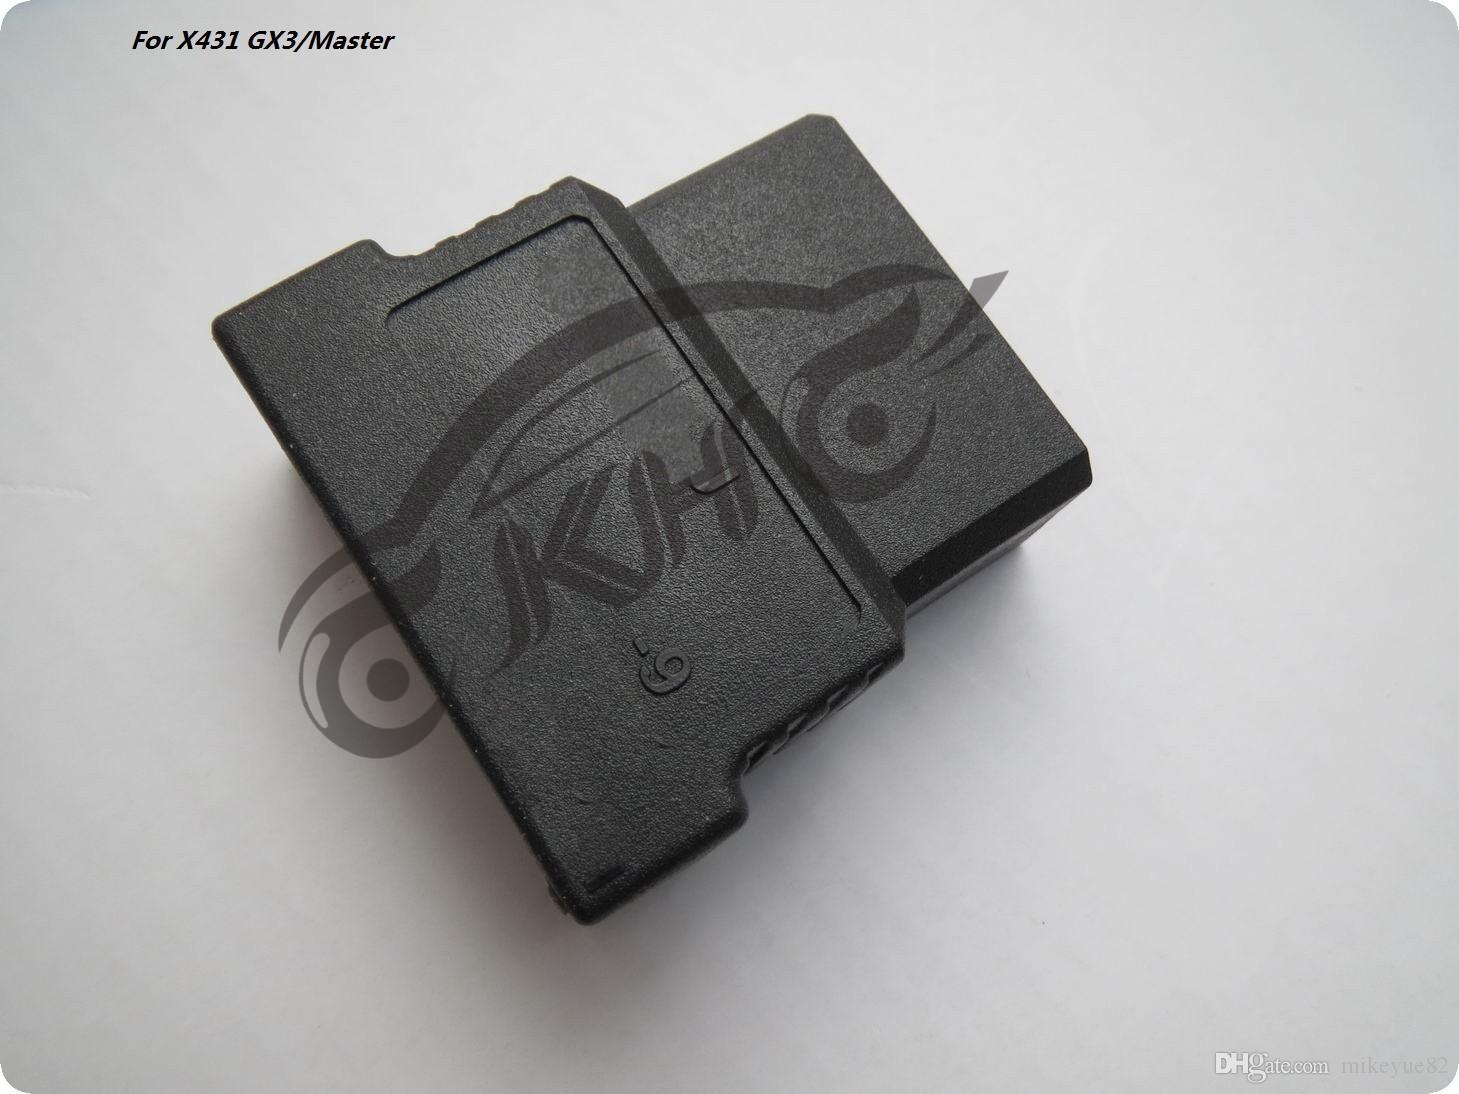 100% Original for LAUNCH X431 for SUBARU9 pin OBD II Connector for 431 GX3 Master OBD-II adaptor OBDII Connecter